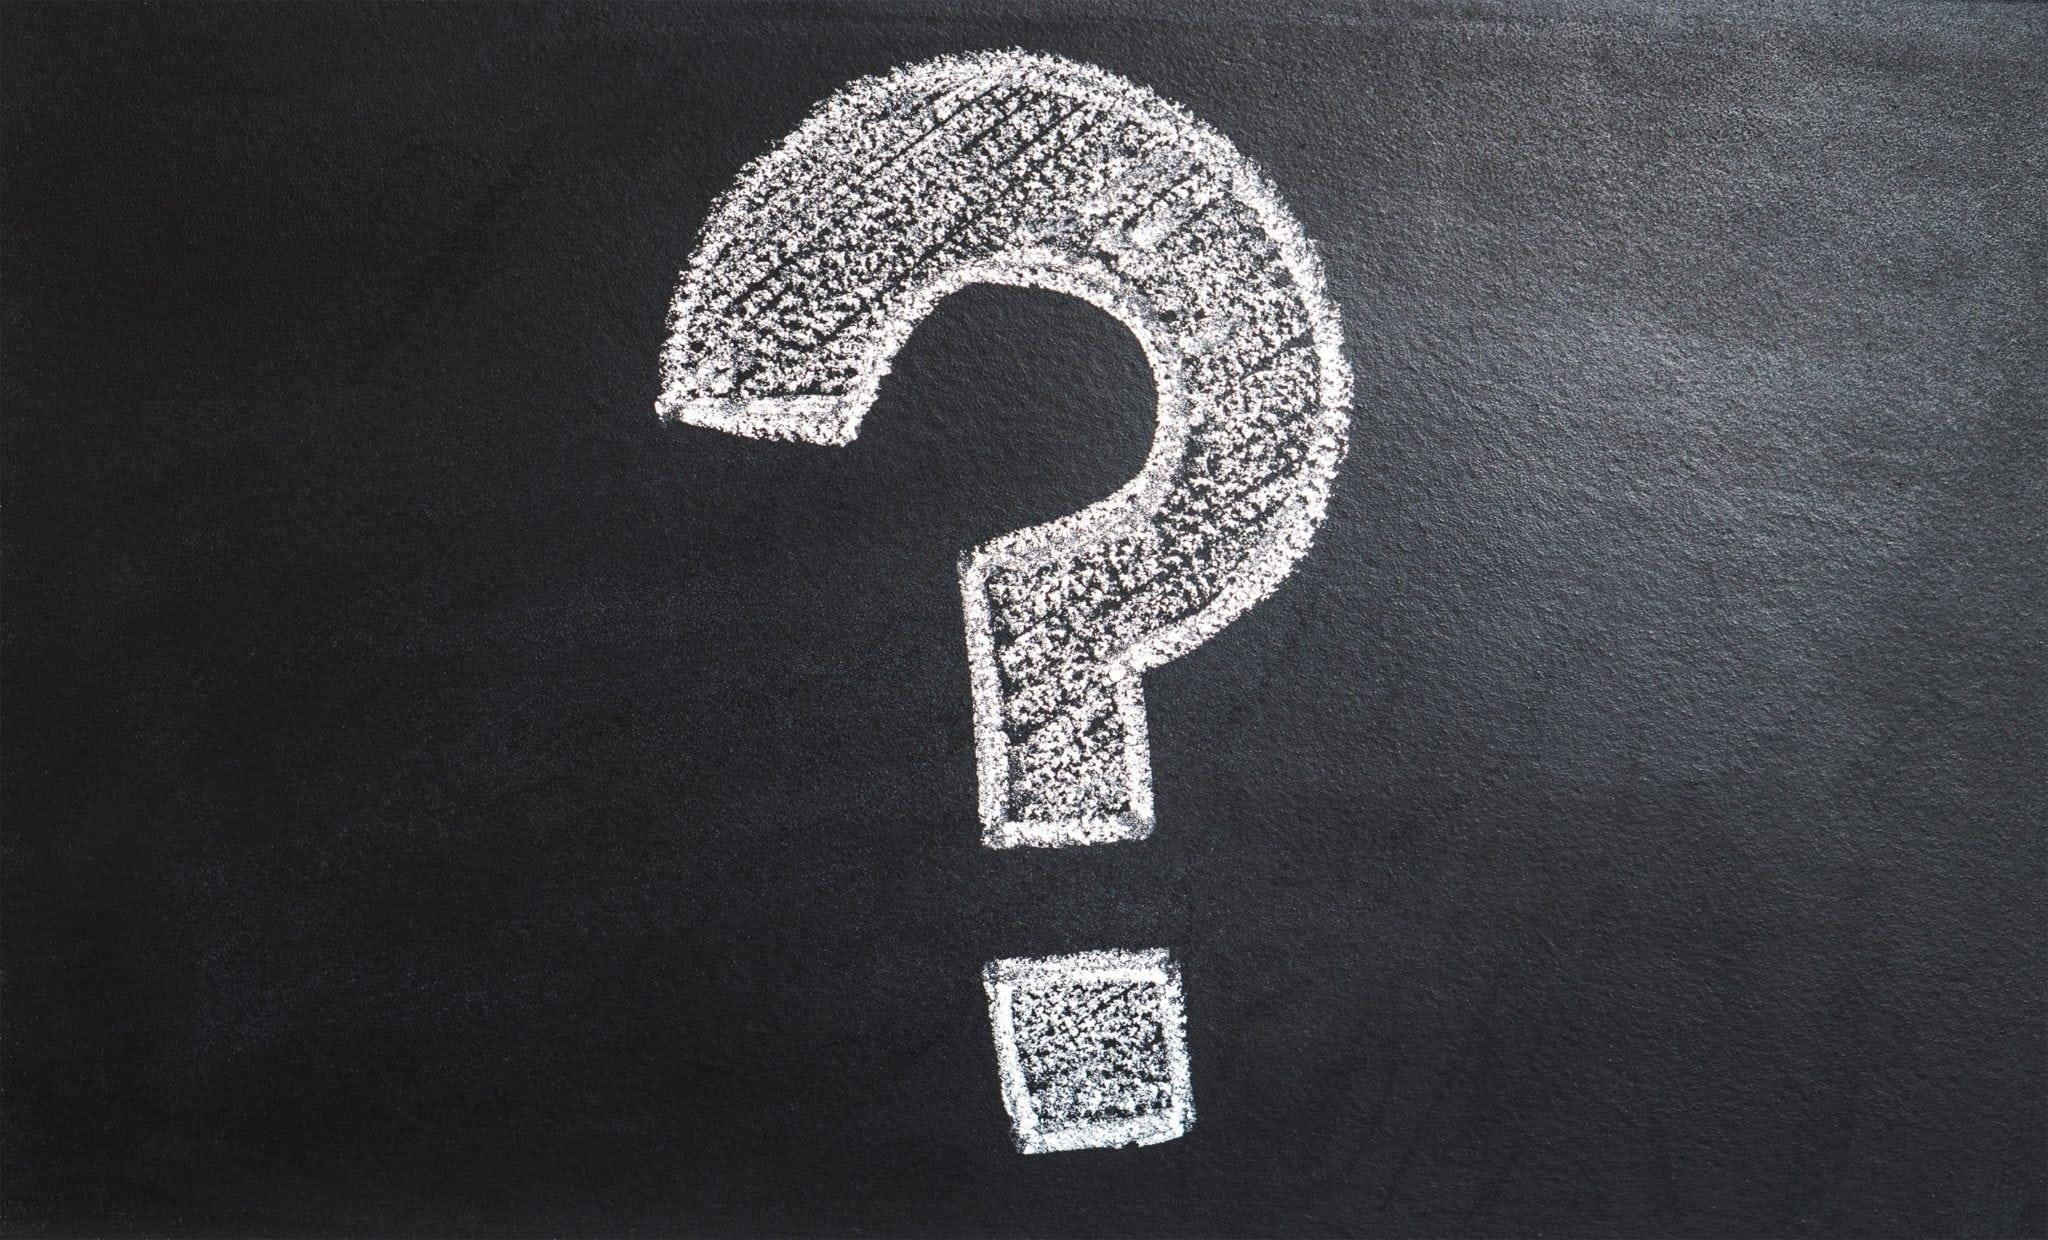 chalk question mark